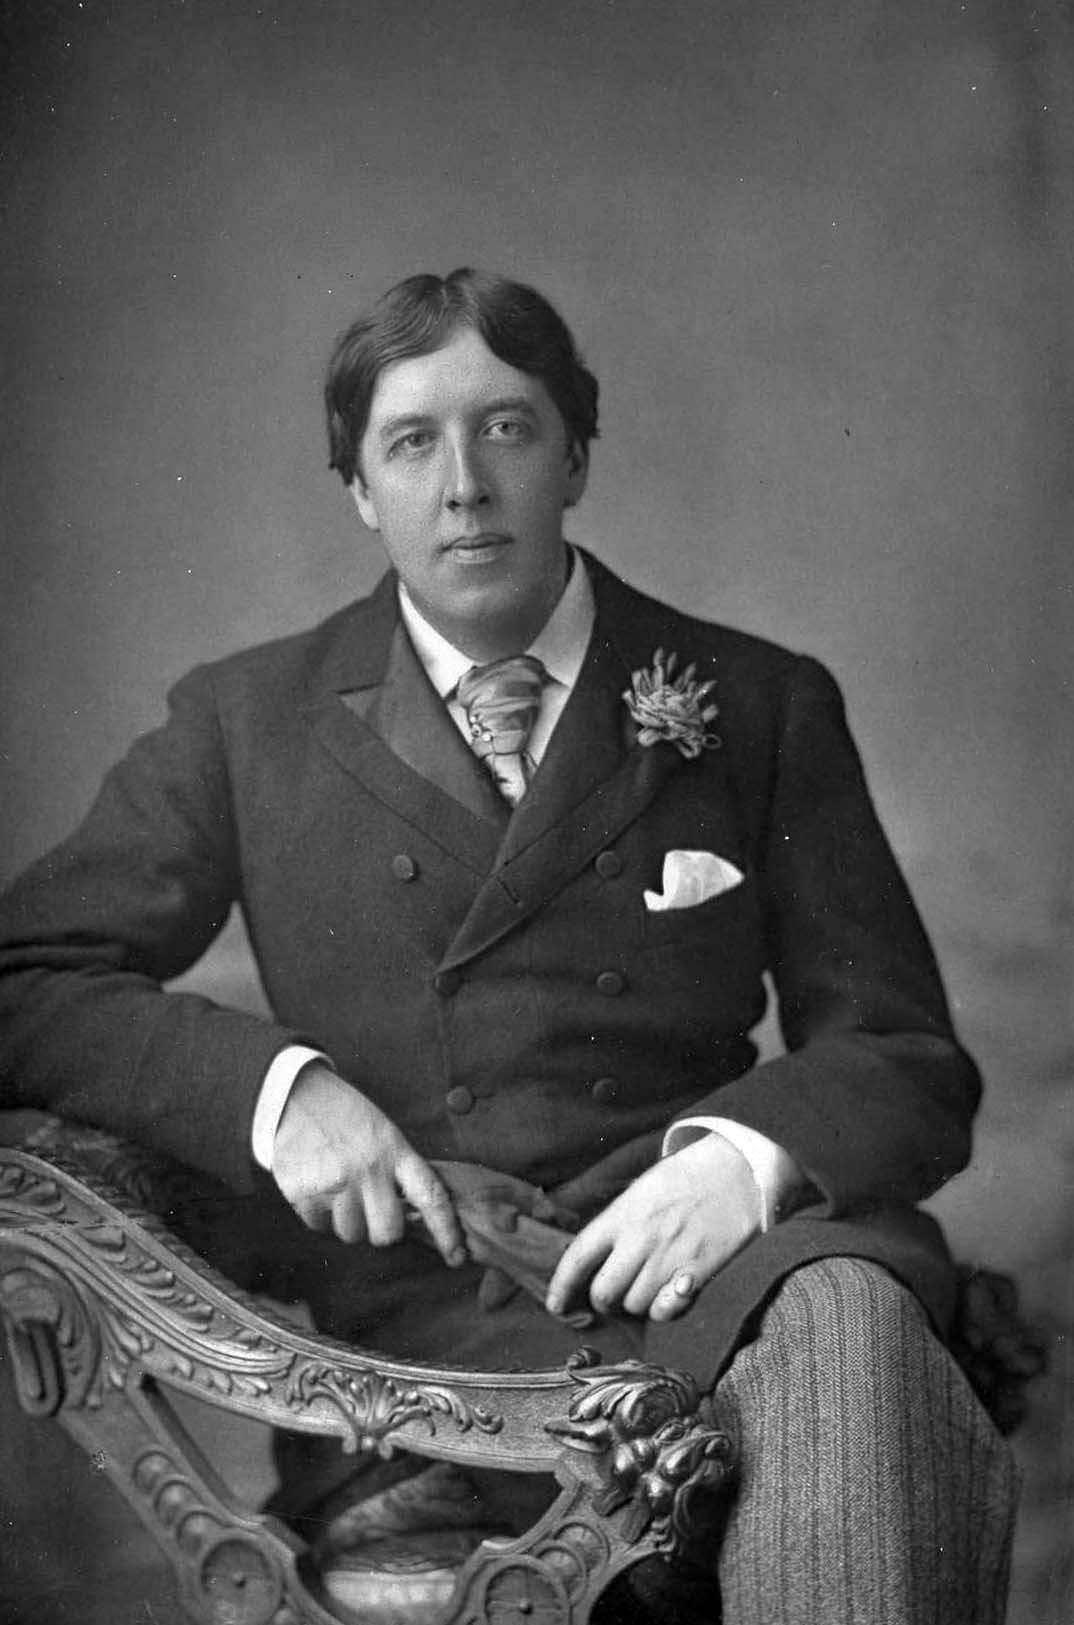 Oscar Wilde in 1889